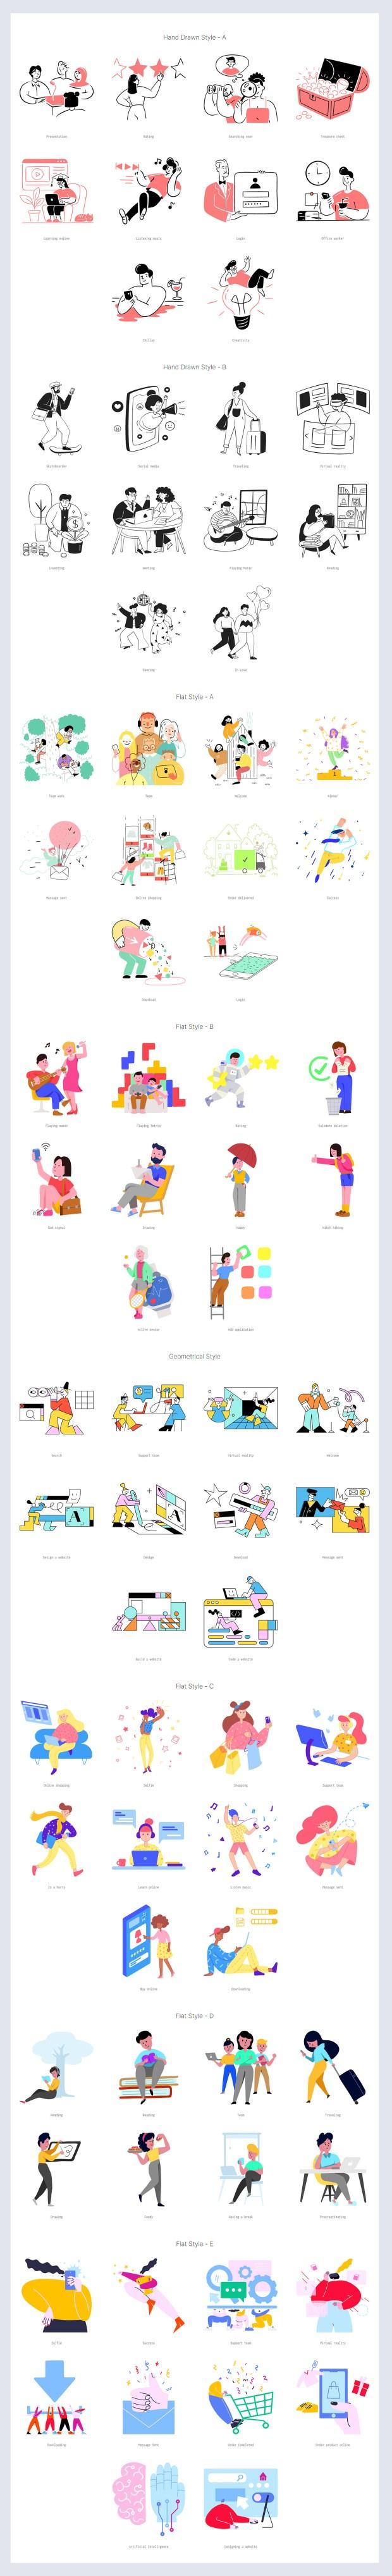 Streamline 80 Free Vector Illustrations